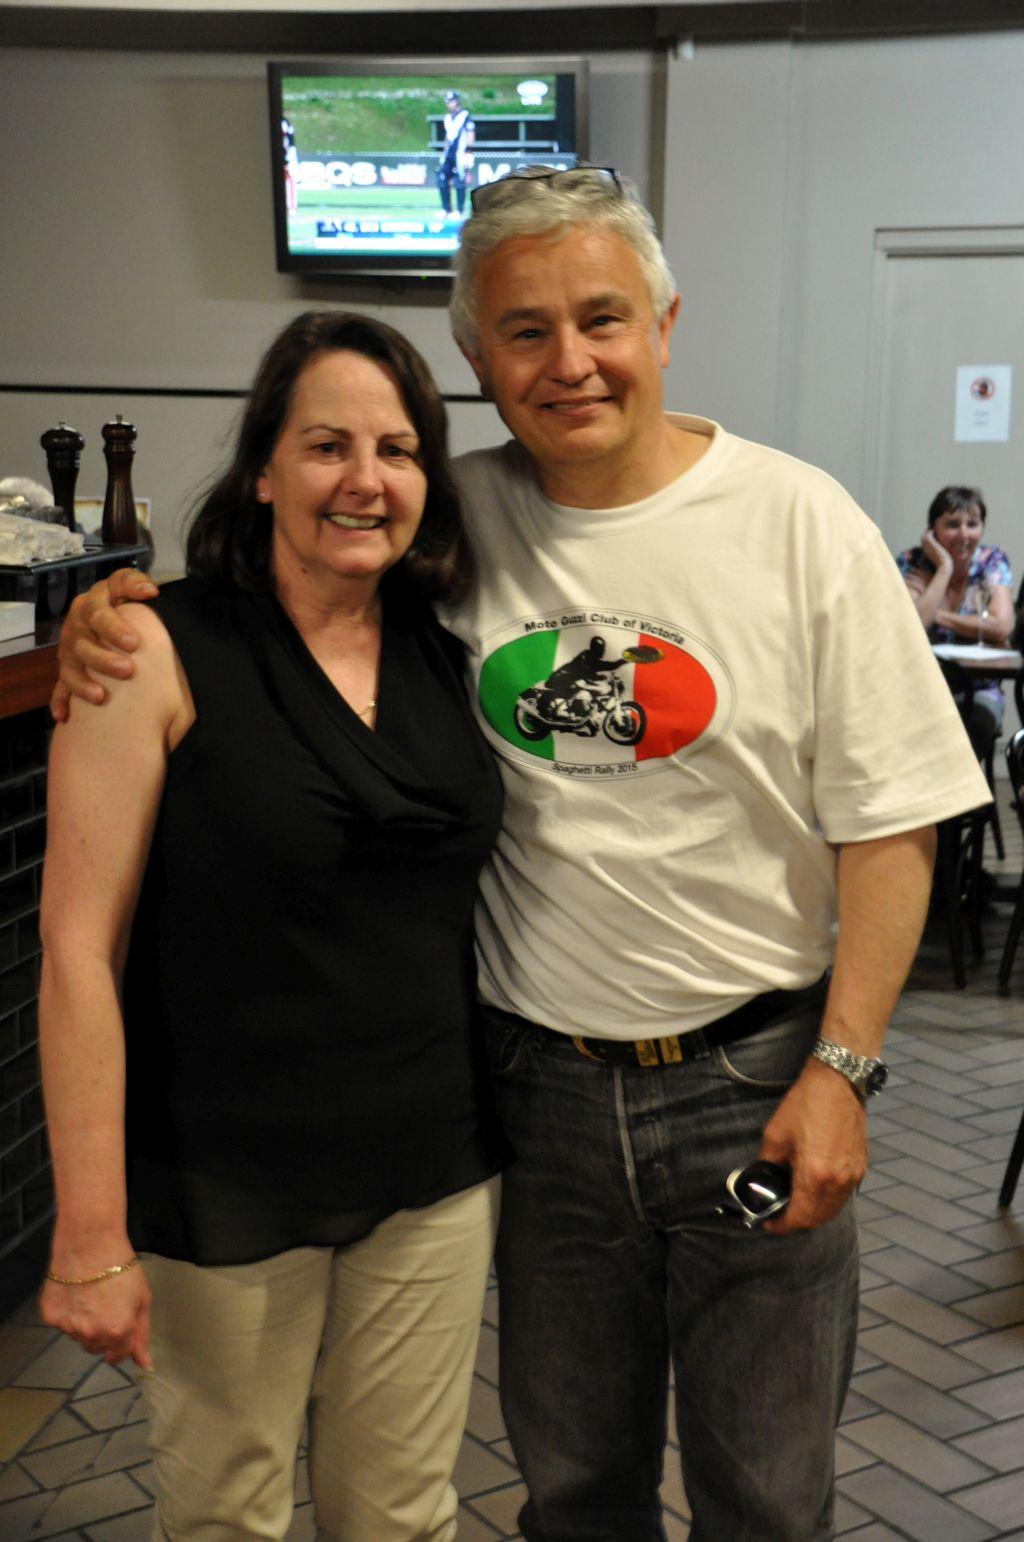 Neil and Kath....cute couple!